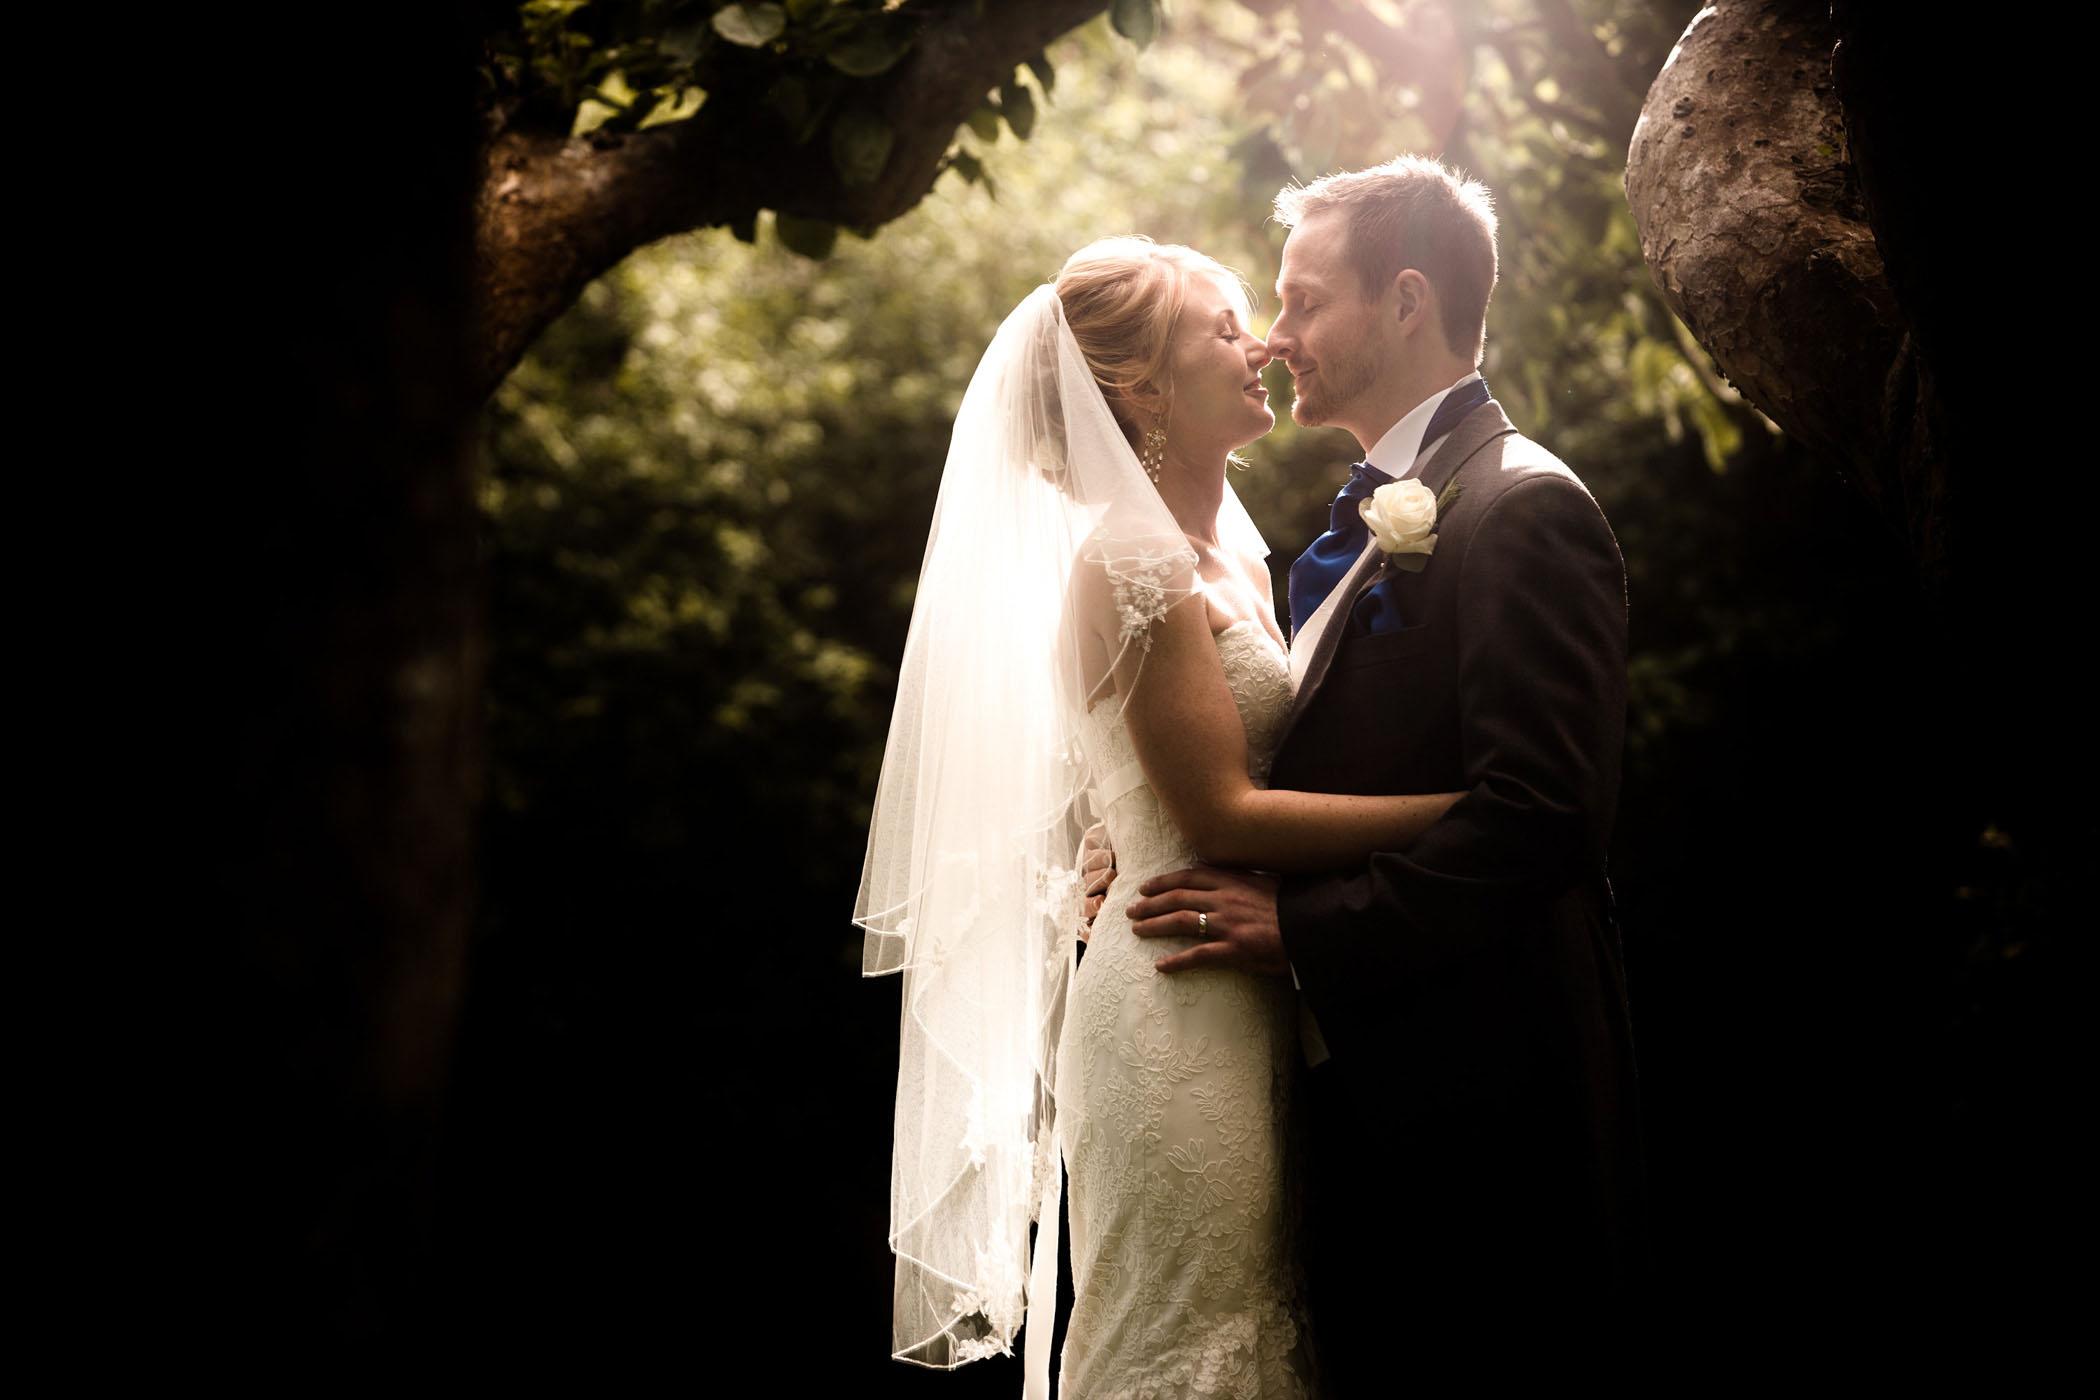 dan_burman_wedding_photography (10).jpg